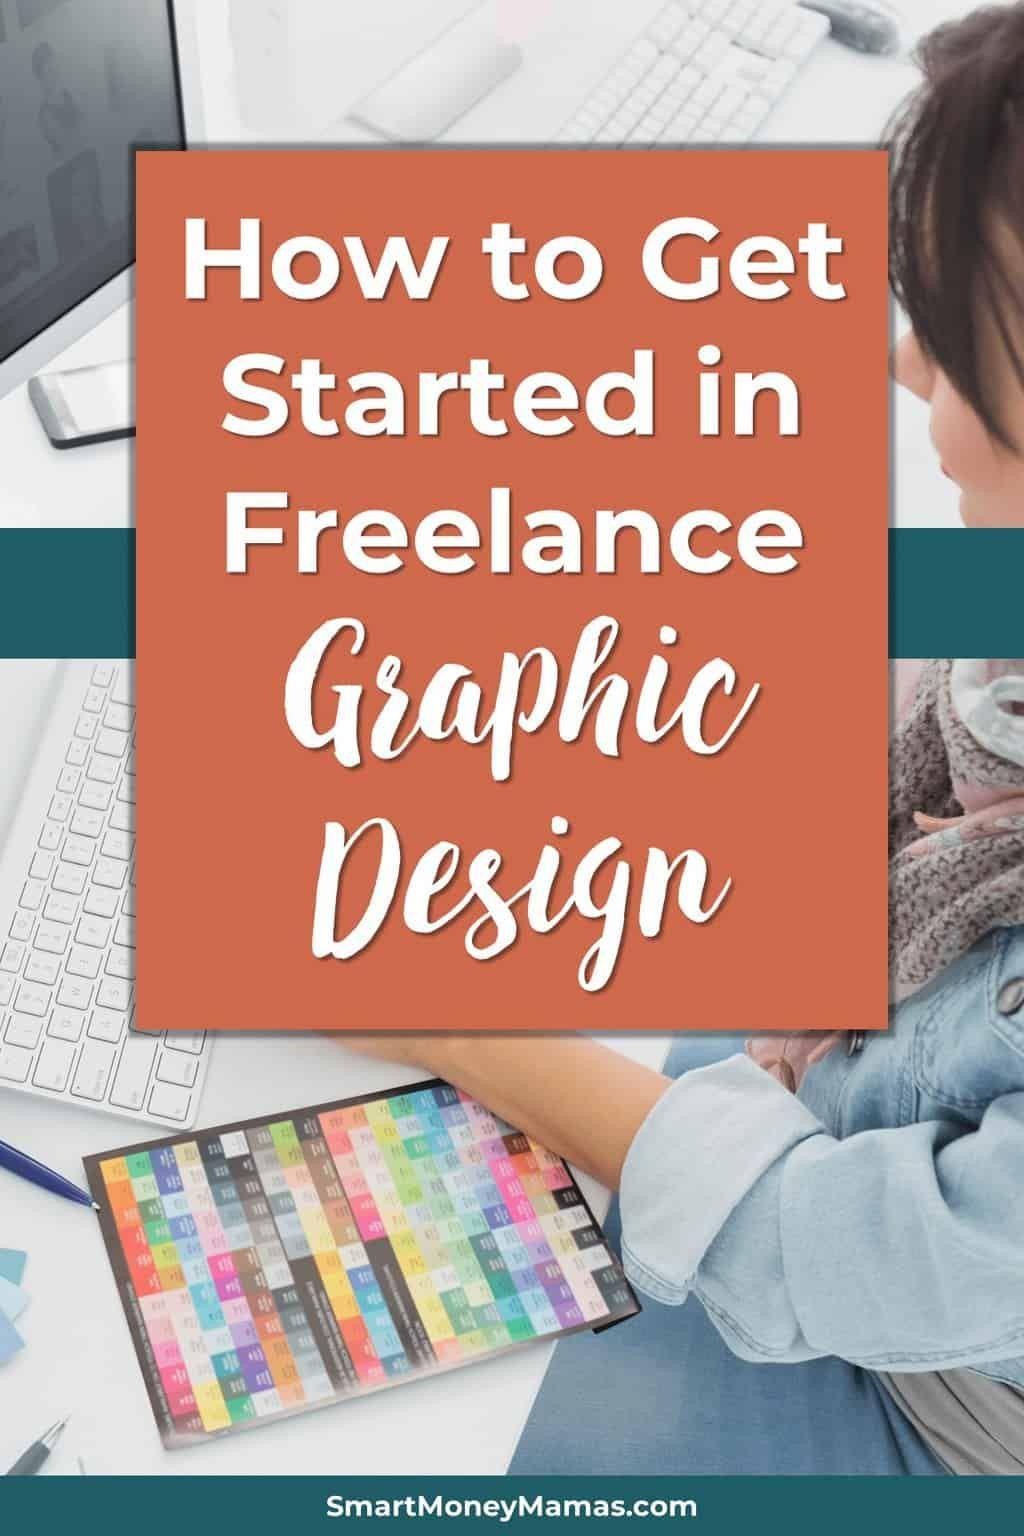 Start Your Graphic Design Business Today No Degree Needed Graphic Design Business Graphic Design School Graphic Design Jobs